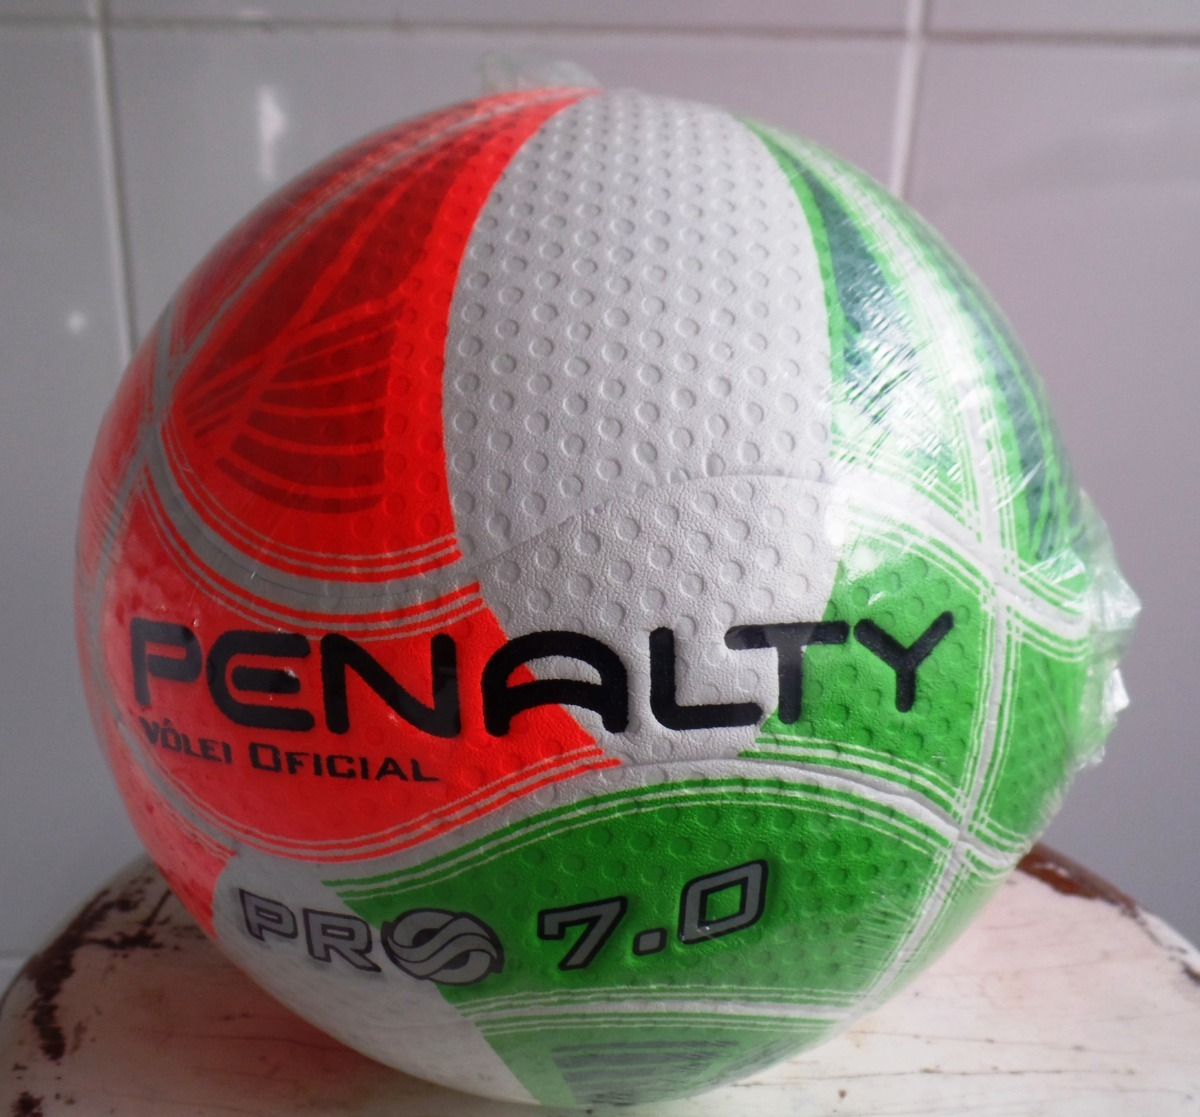 bola de vôlei penalty pro 7.0 oficial - nova - brinde bomba. Carregando zoom . 18d4693130611